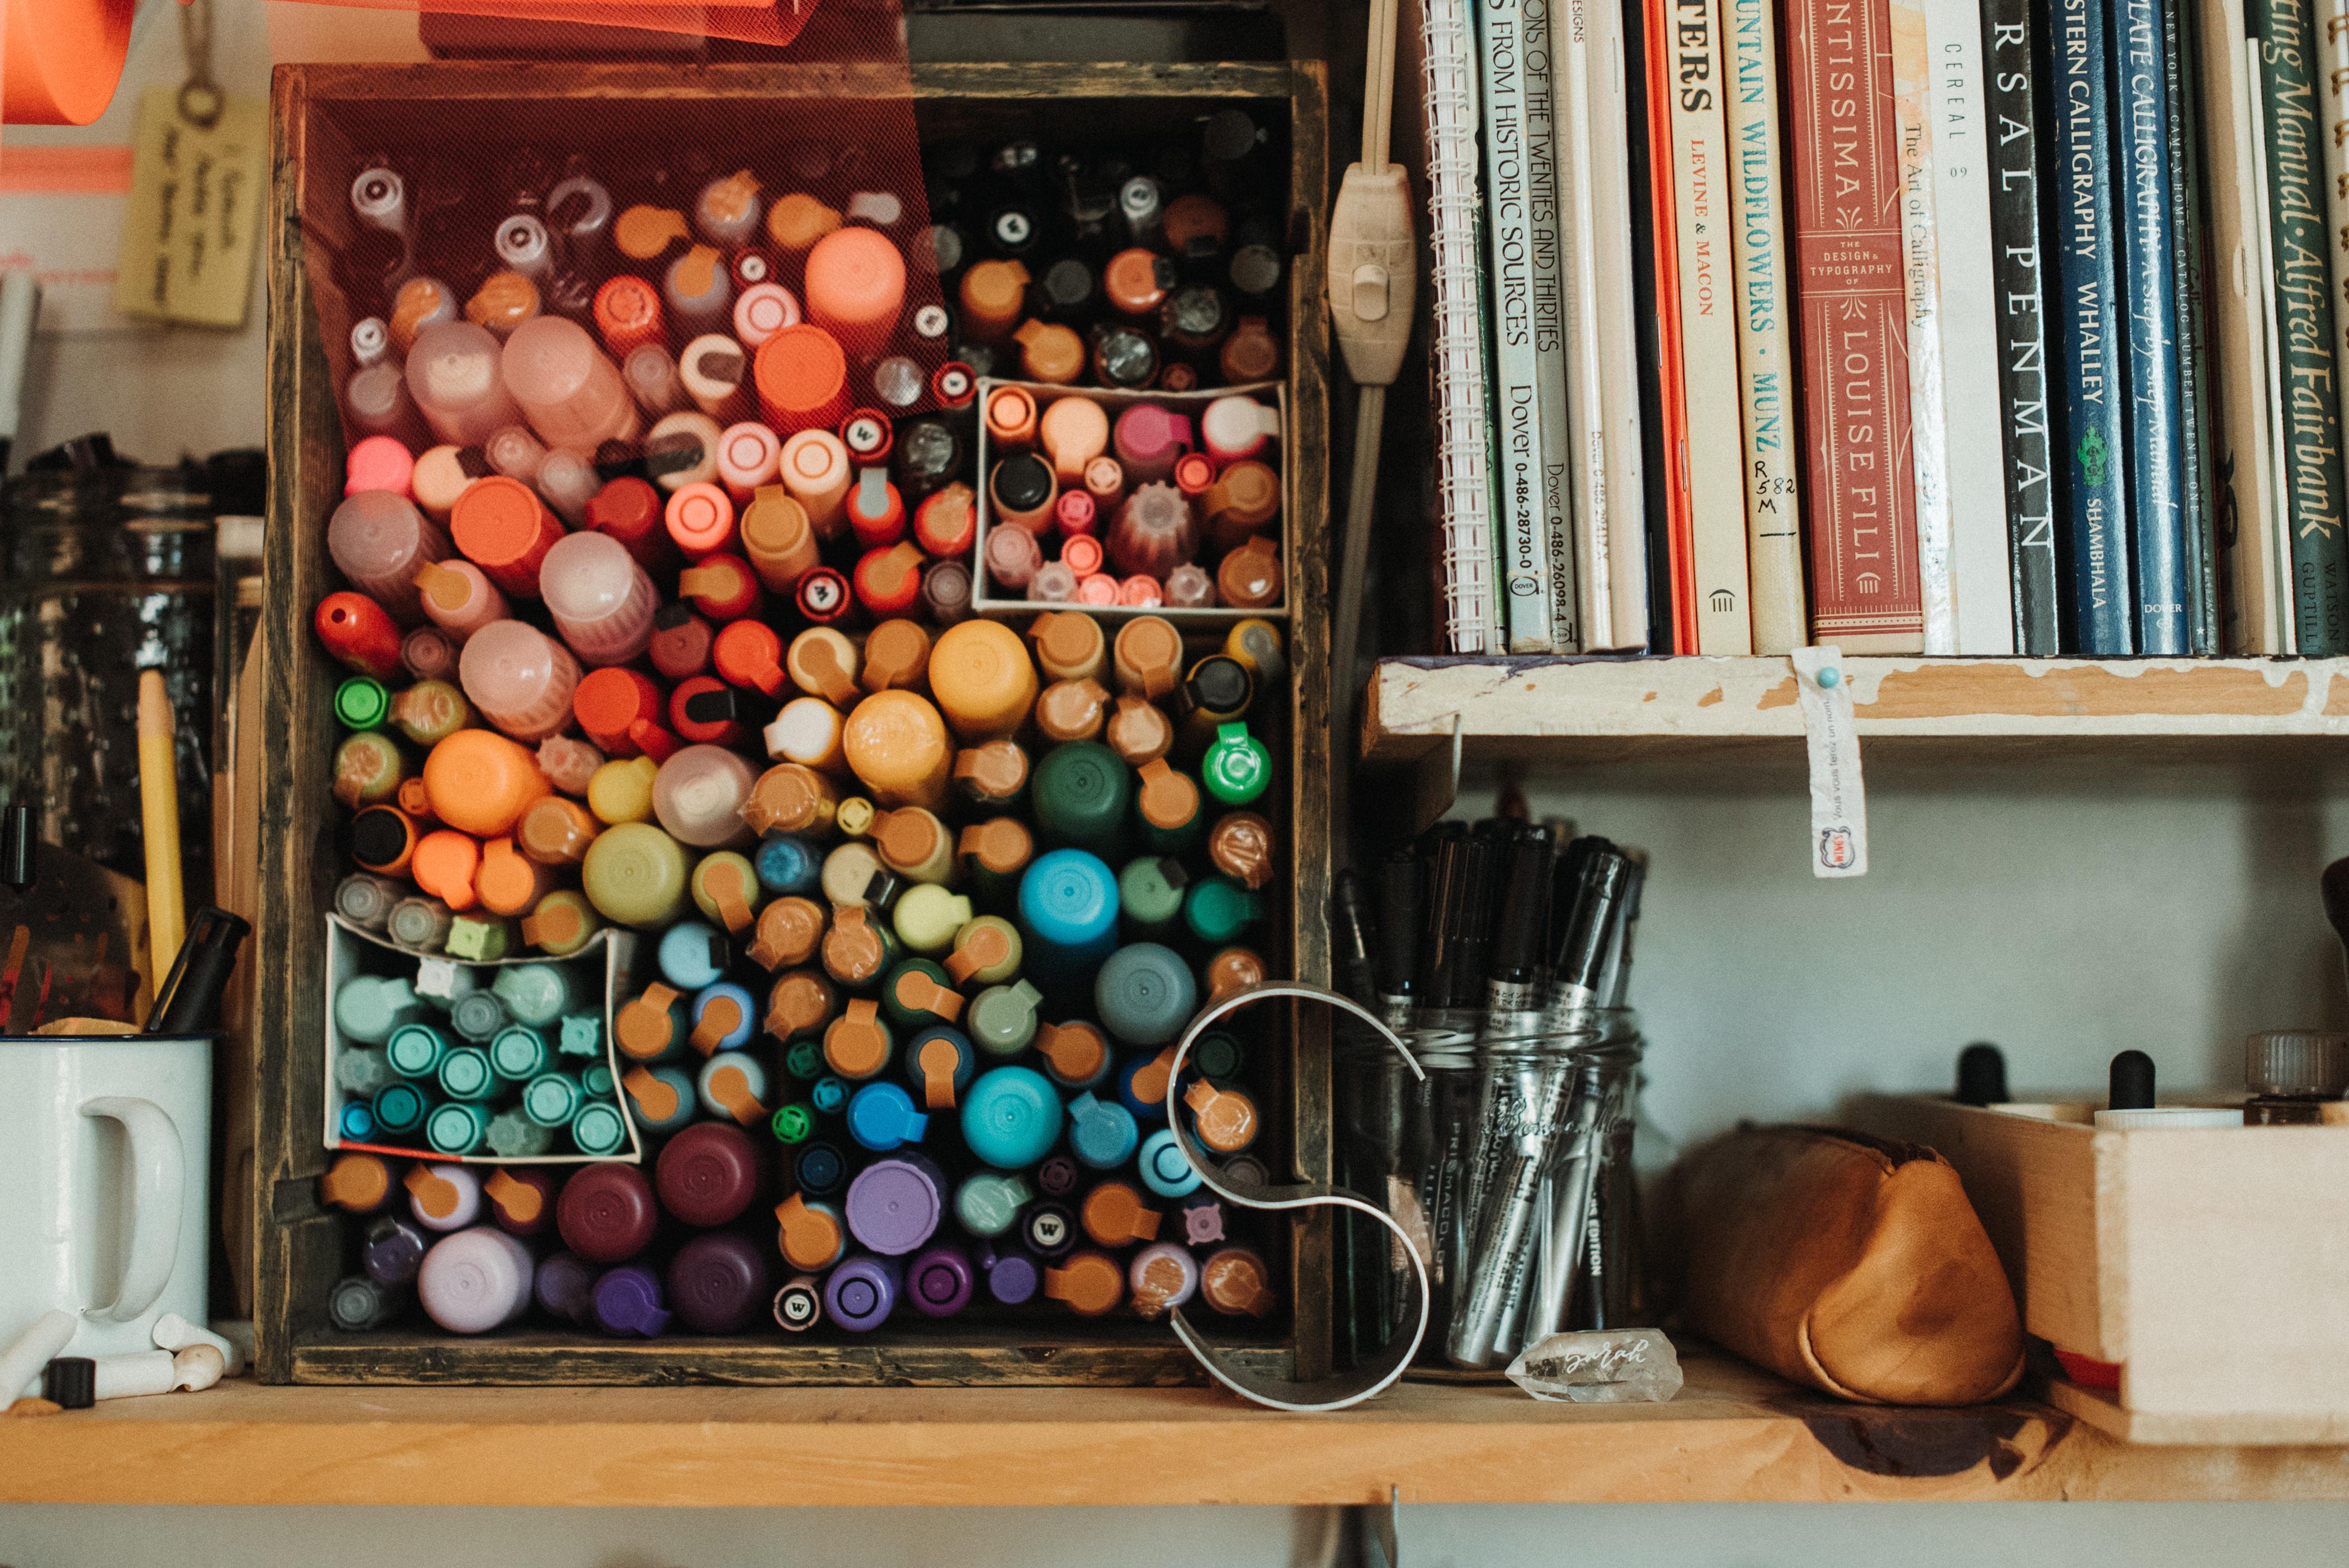 Posca Pen Heaven at Arrow Art Studio (photo by Jess Rankin - jessrankin.com)